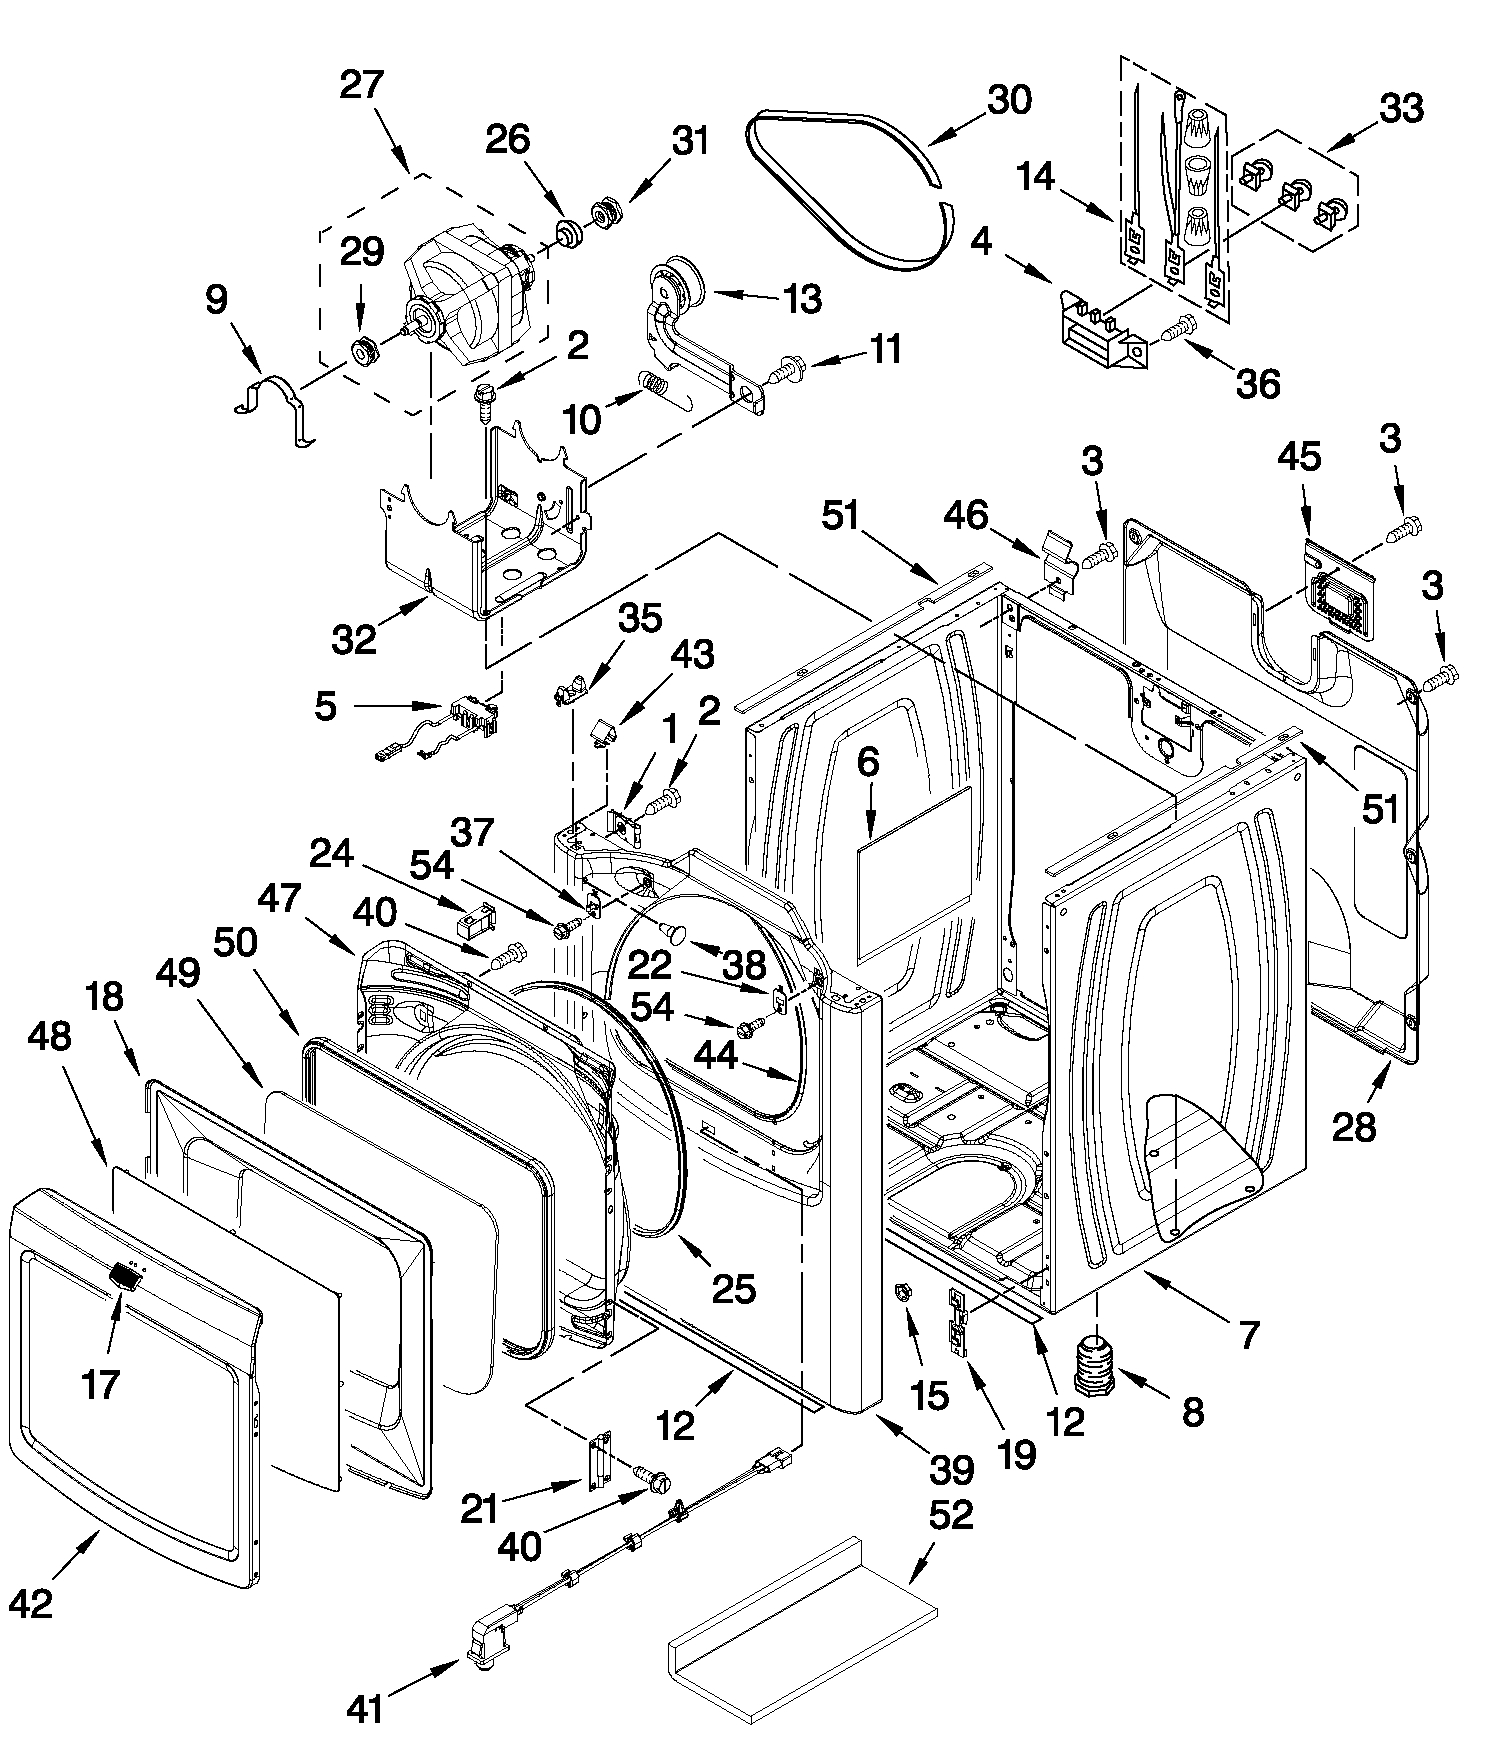 Wiring Diagram For Maytag Centennial Dryer